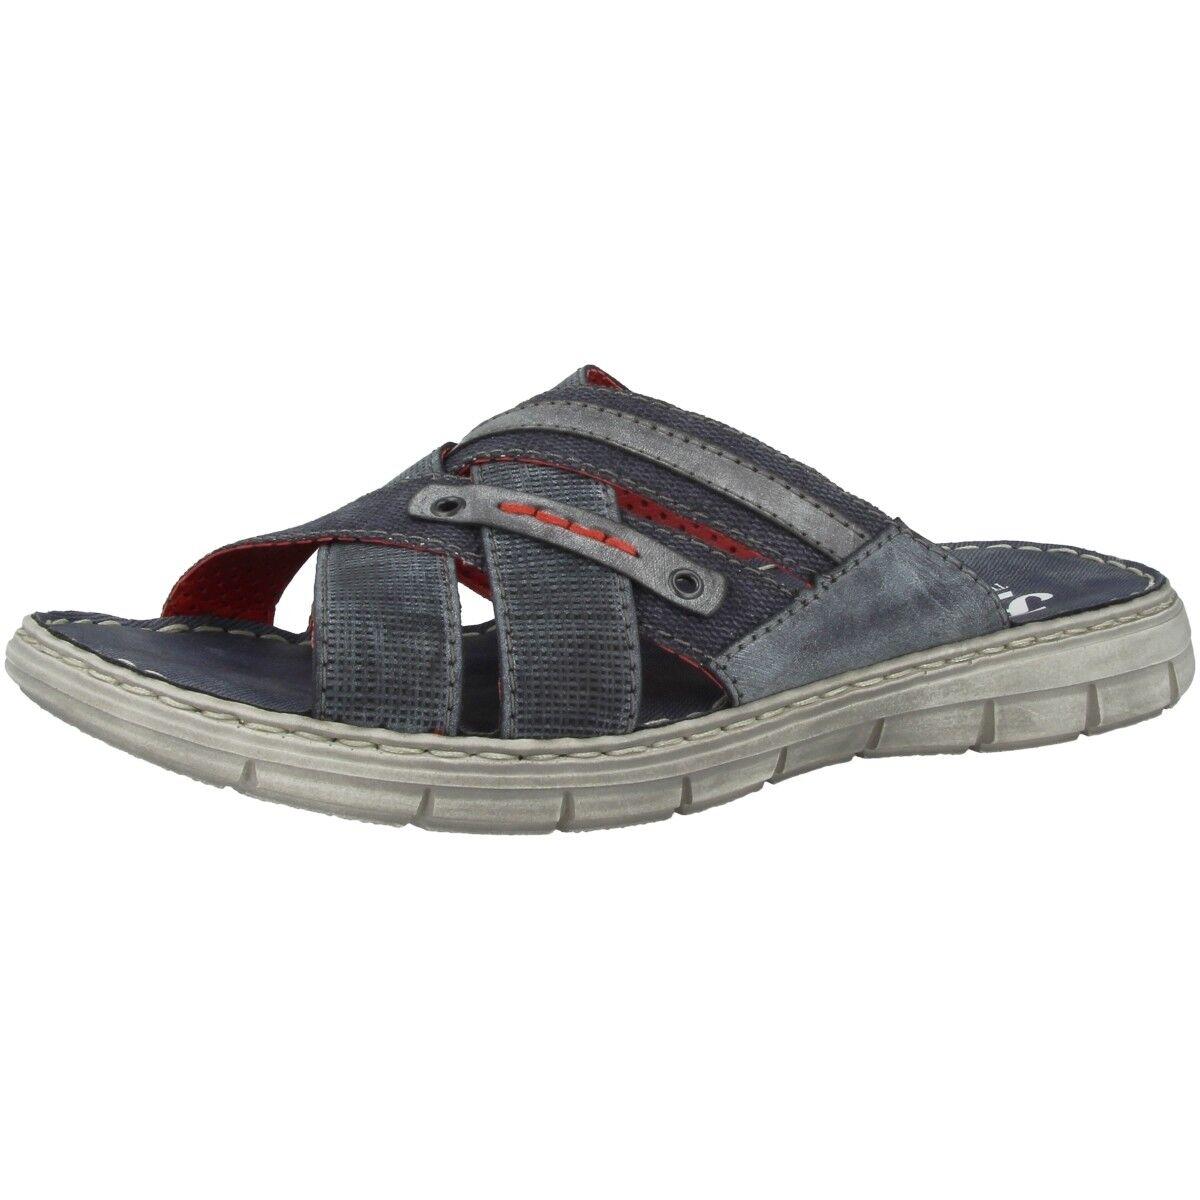 Rieker Serbia-Tessuto-Serbia Sandali Pantofole Anti-stress shoes 25193-15